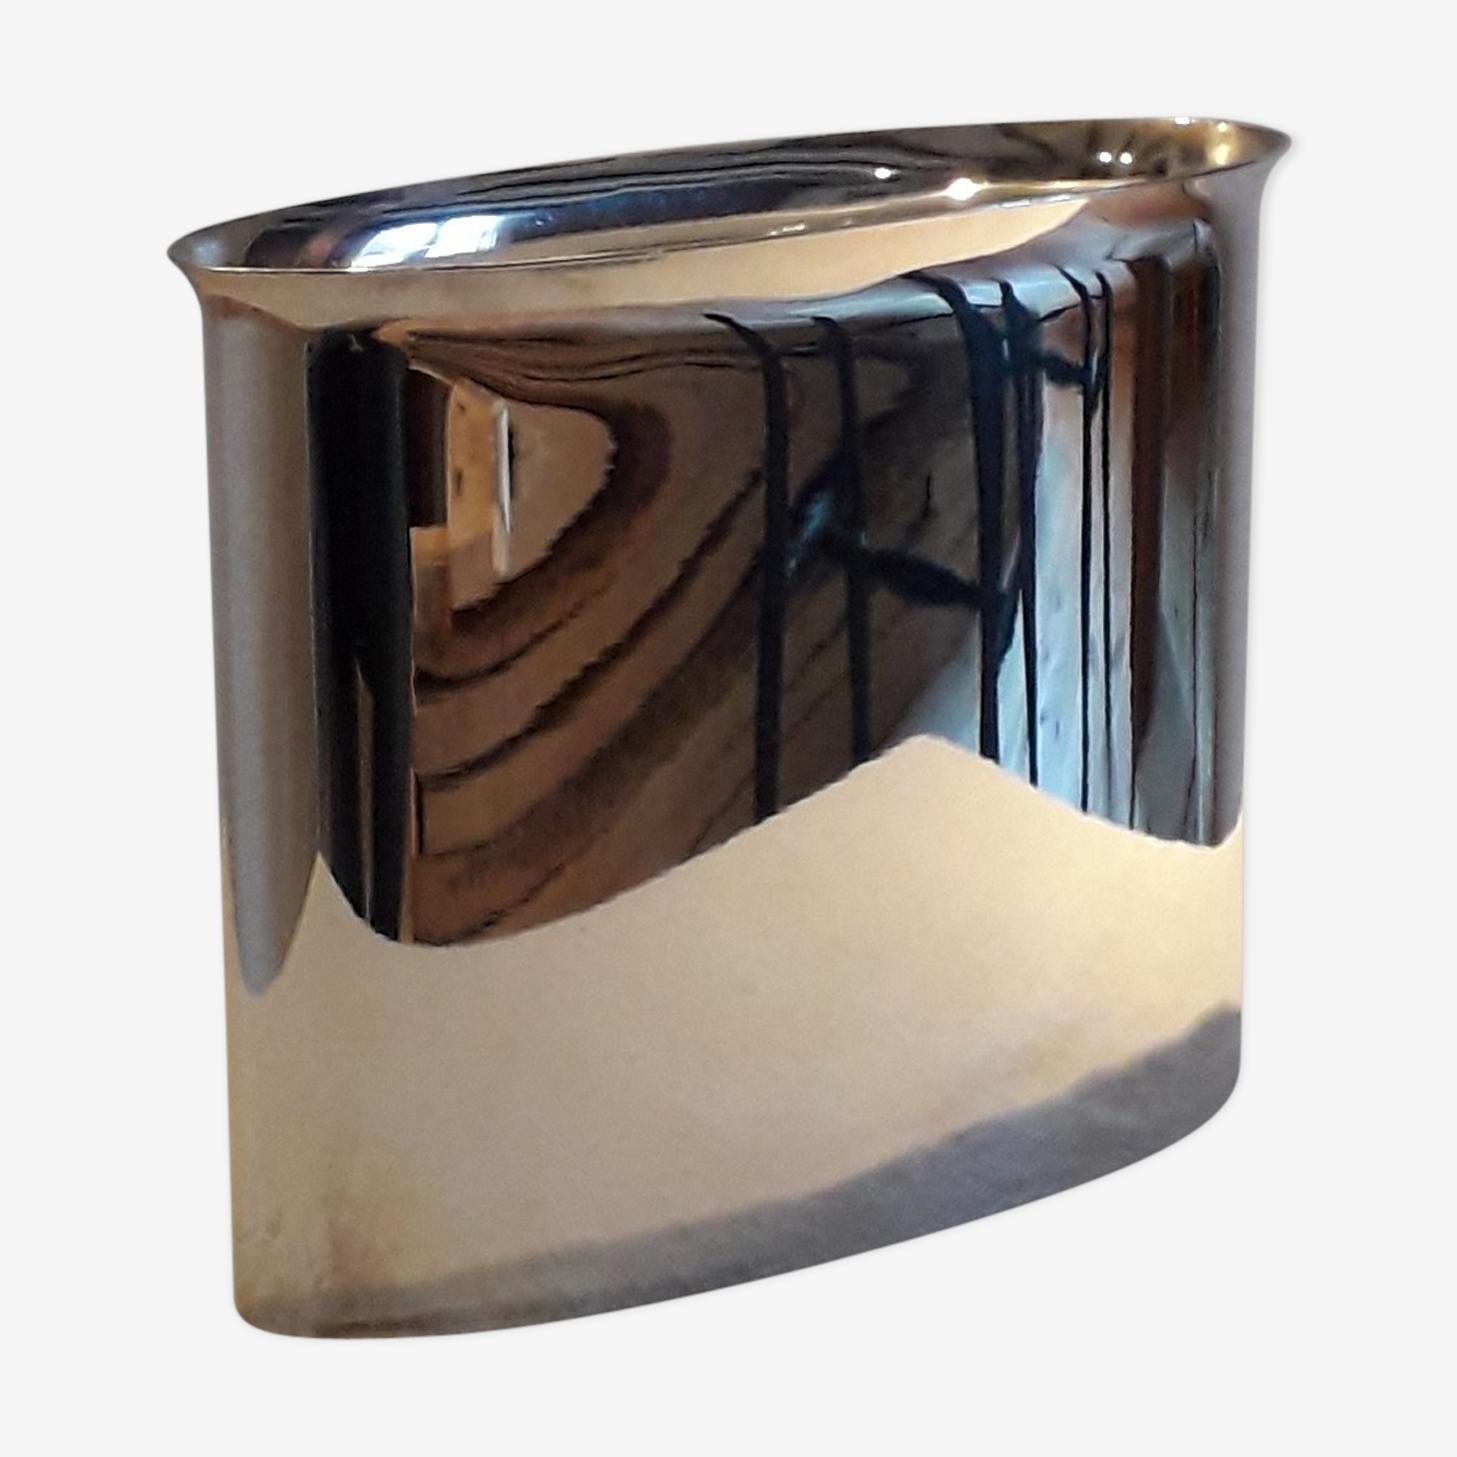 Gunilla Lindahl design vase for Scandia Present, Sweden, 70's